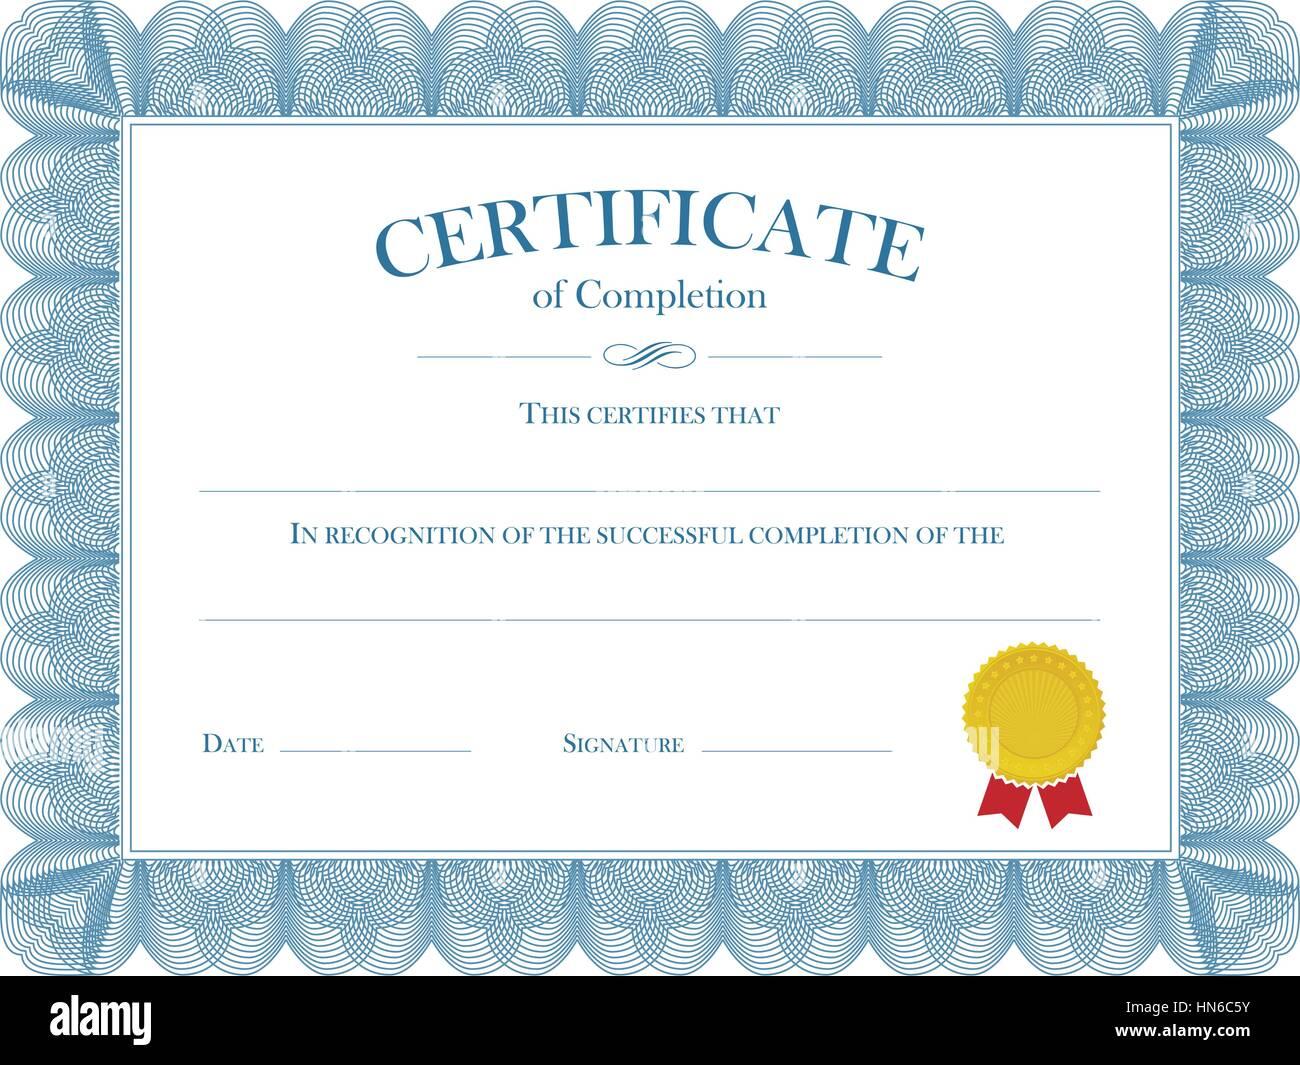 Award Certificate Completion Stock Photos & Award Certificate ...